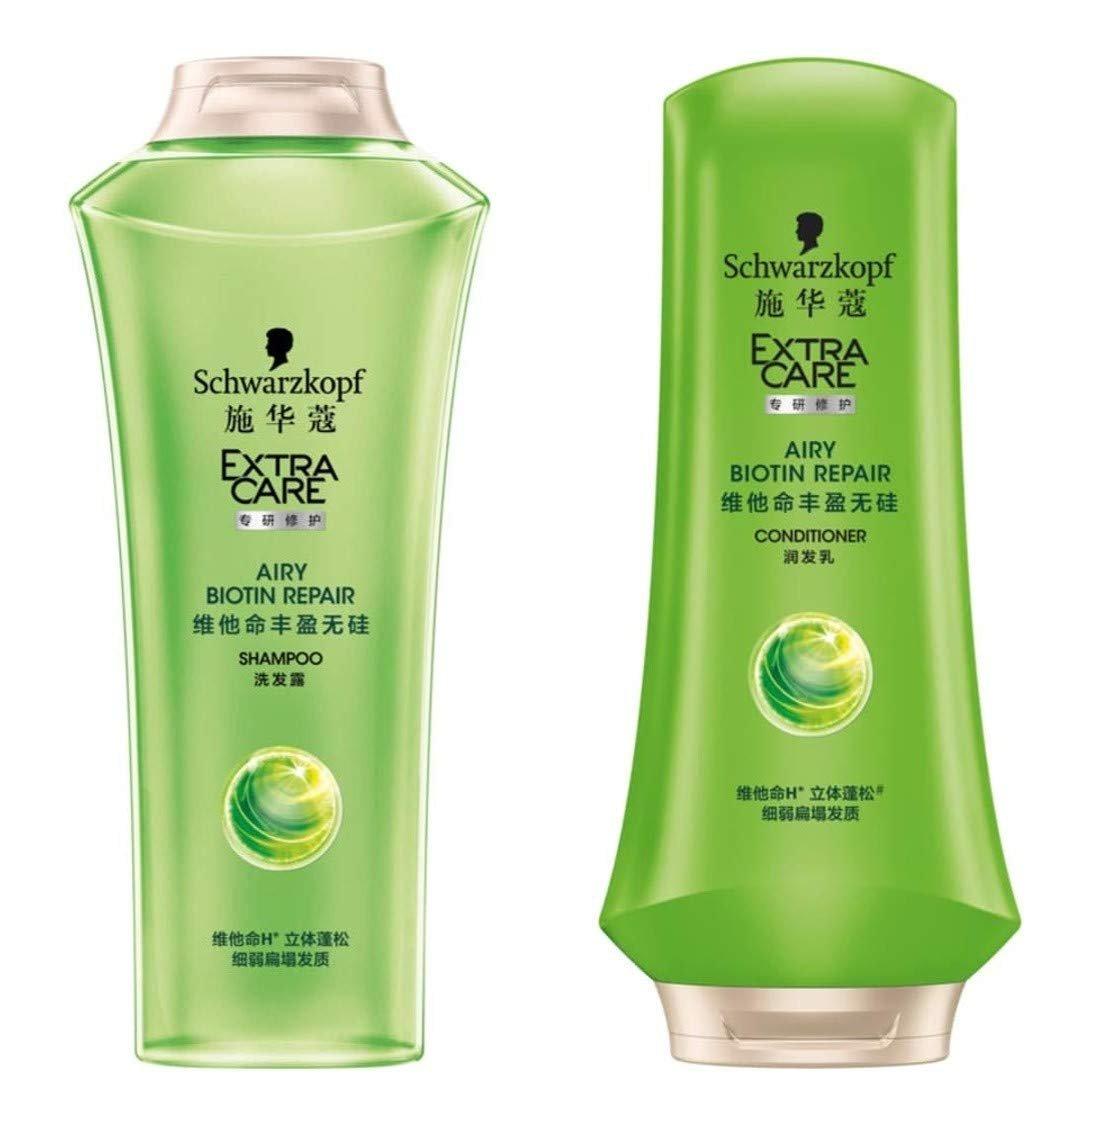 EXTRA CARE Airy Biotin Repair Shampoo and Conditioner 400 ml.